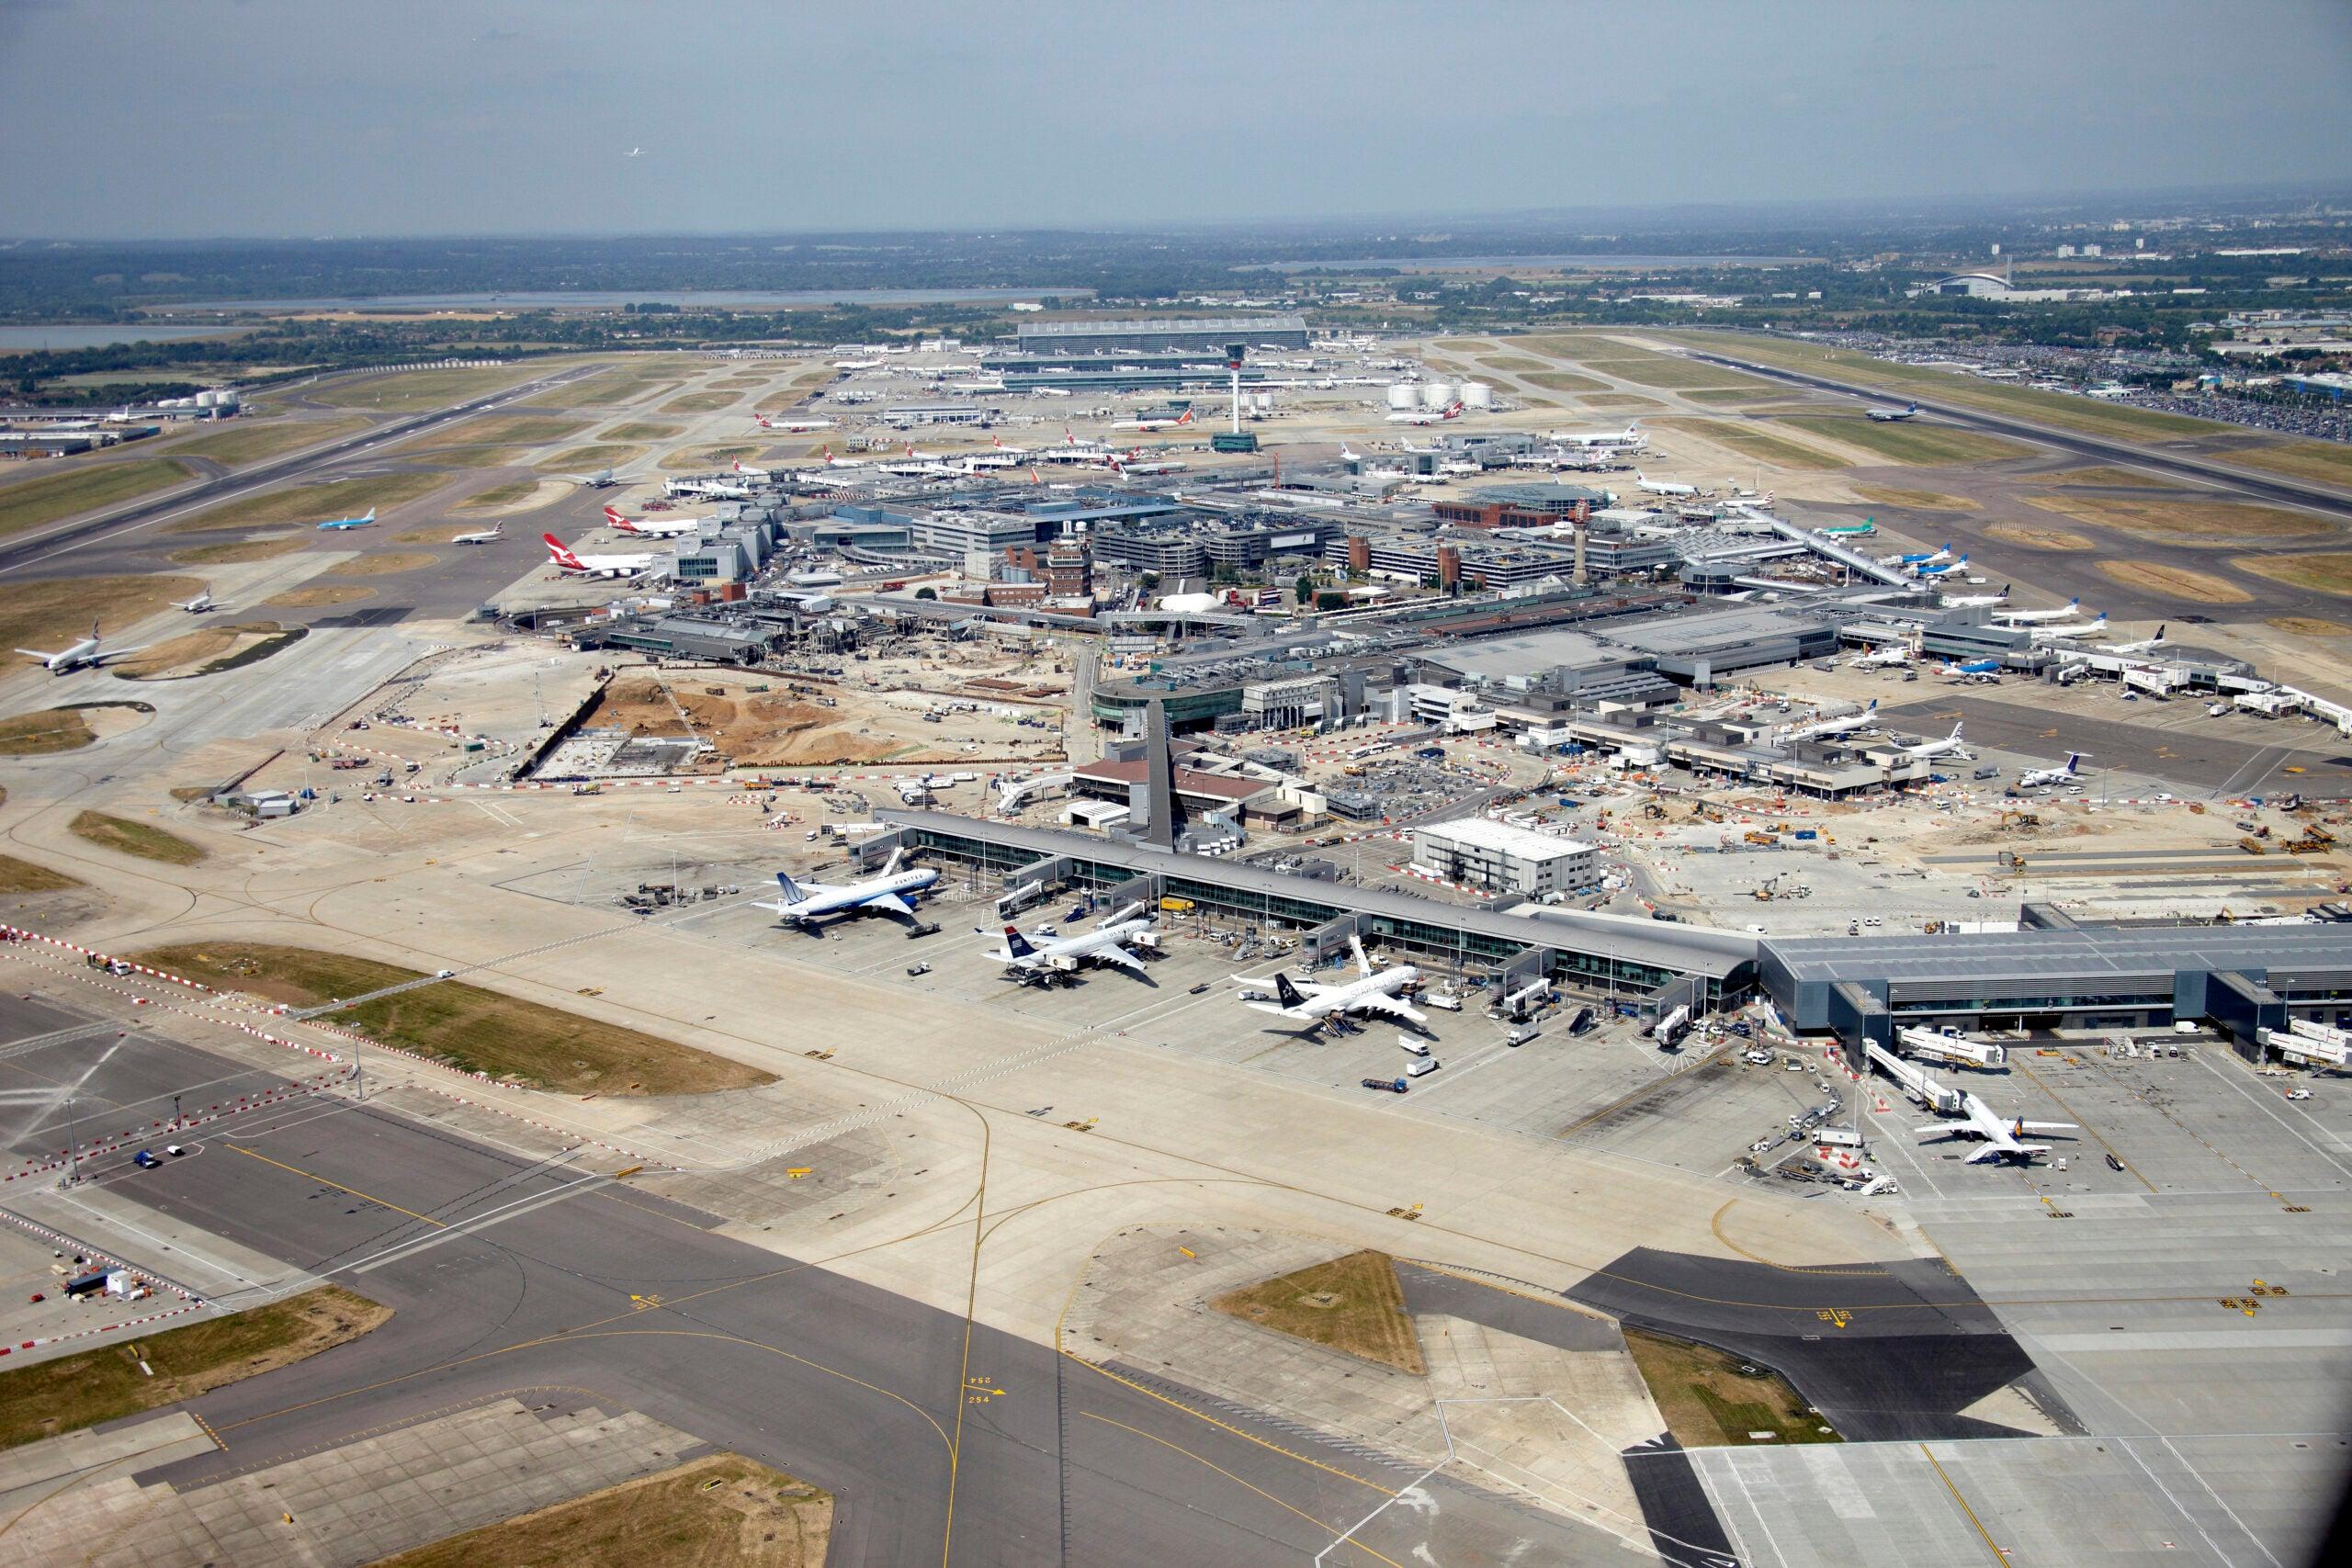 Heathrow loses title as busiest airport in Europe